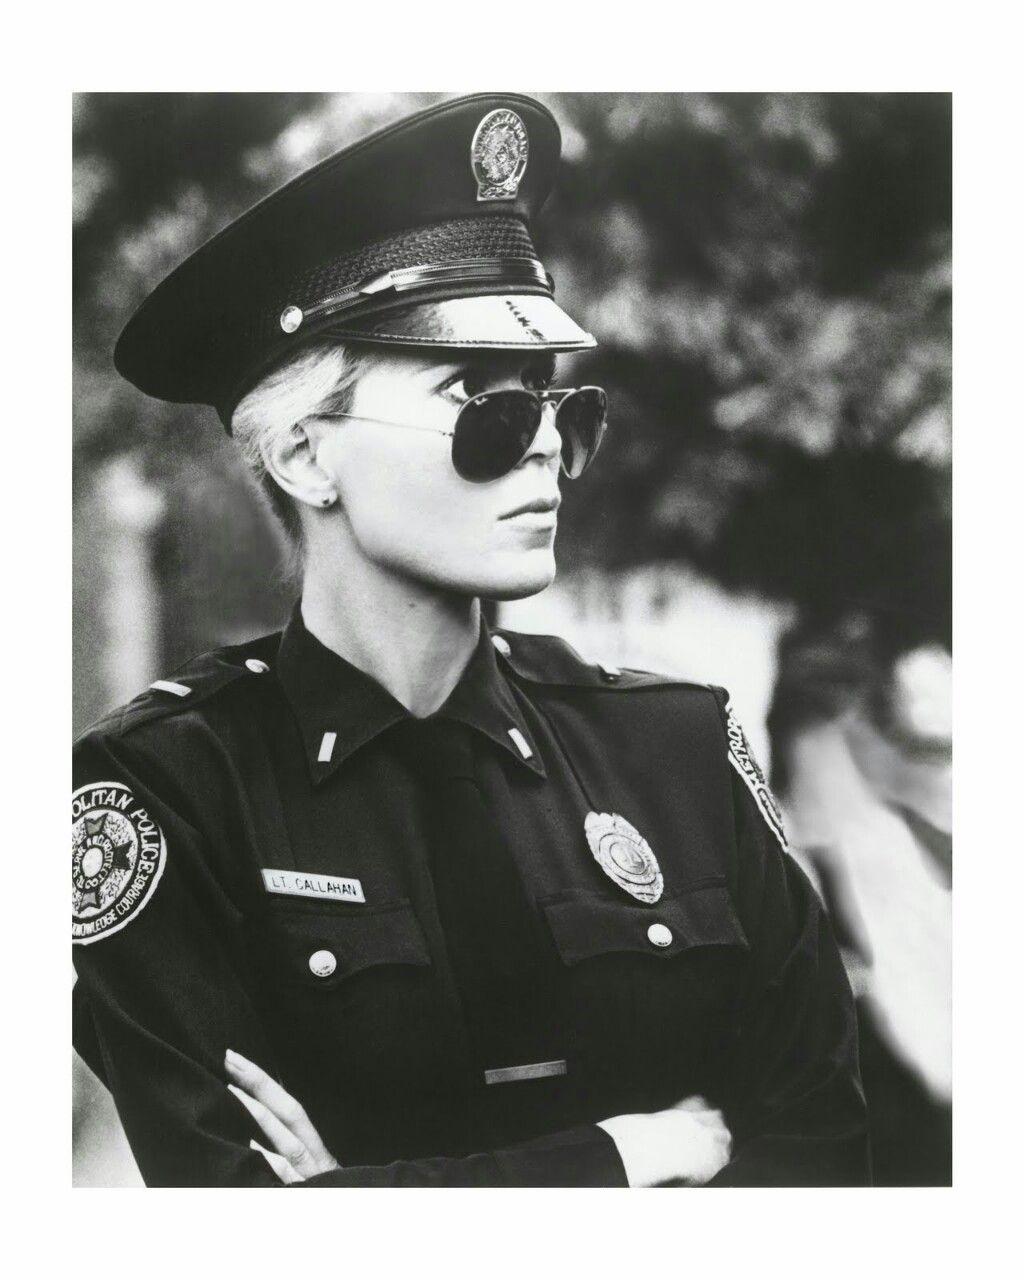 Leslie Easterbrook, Police Academy | Police academy movie